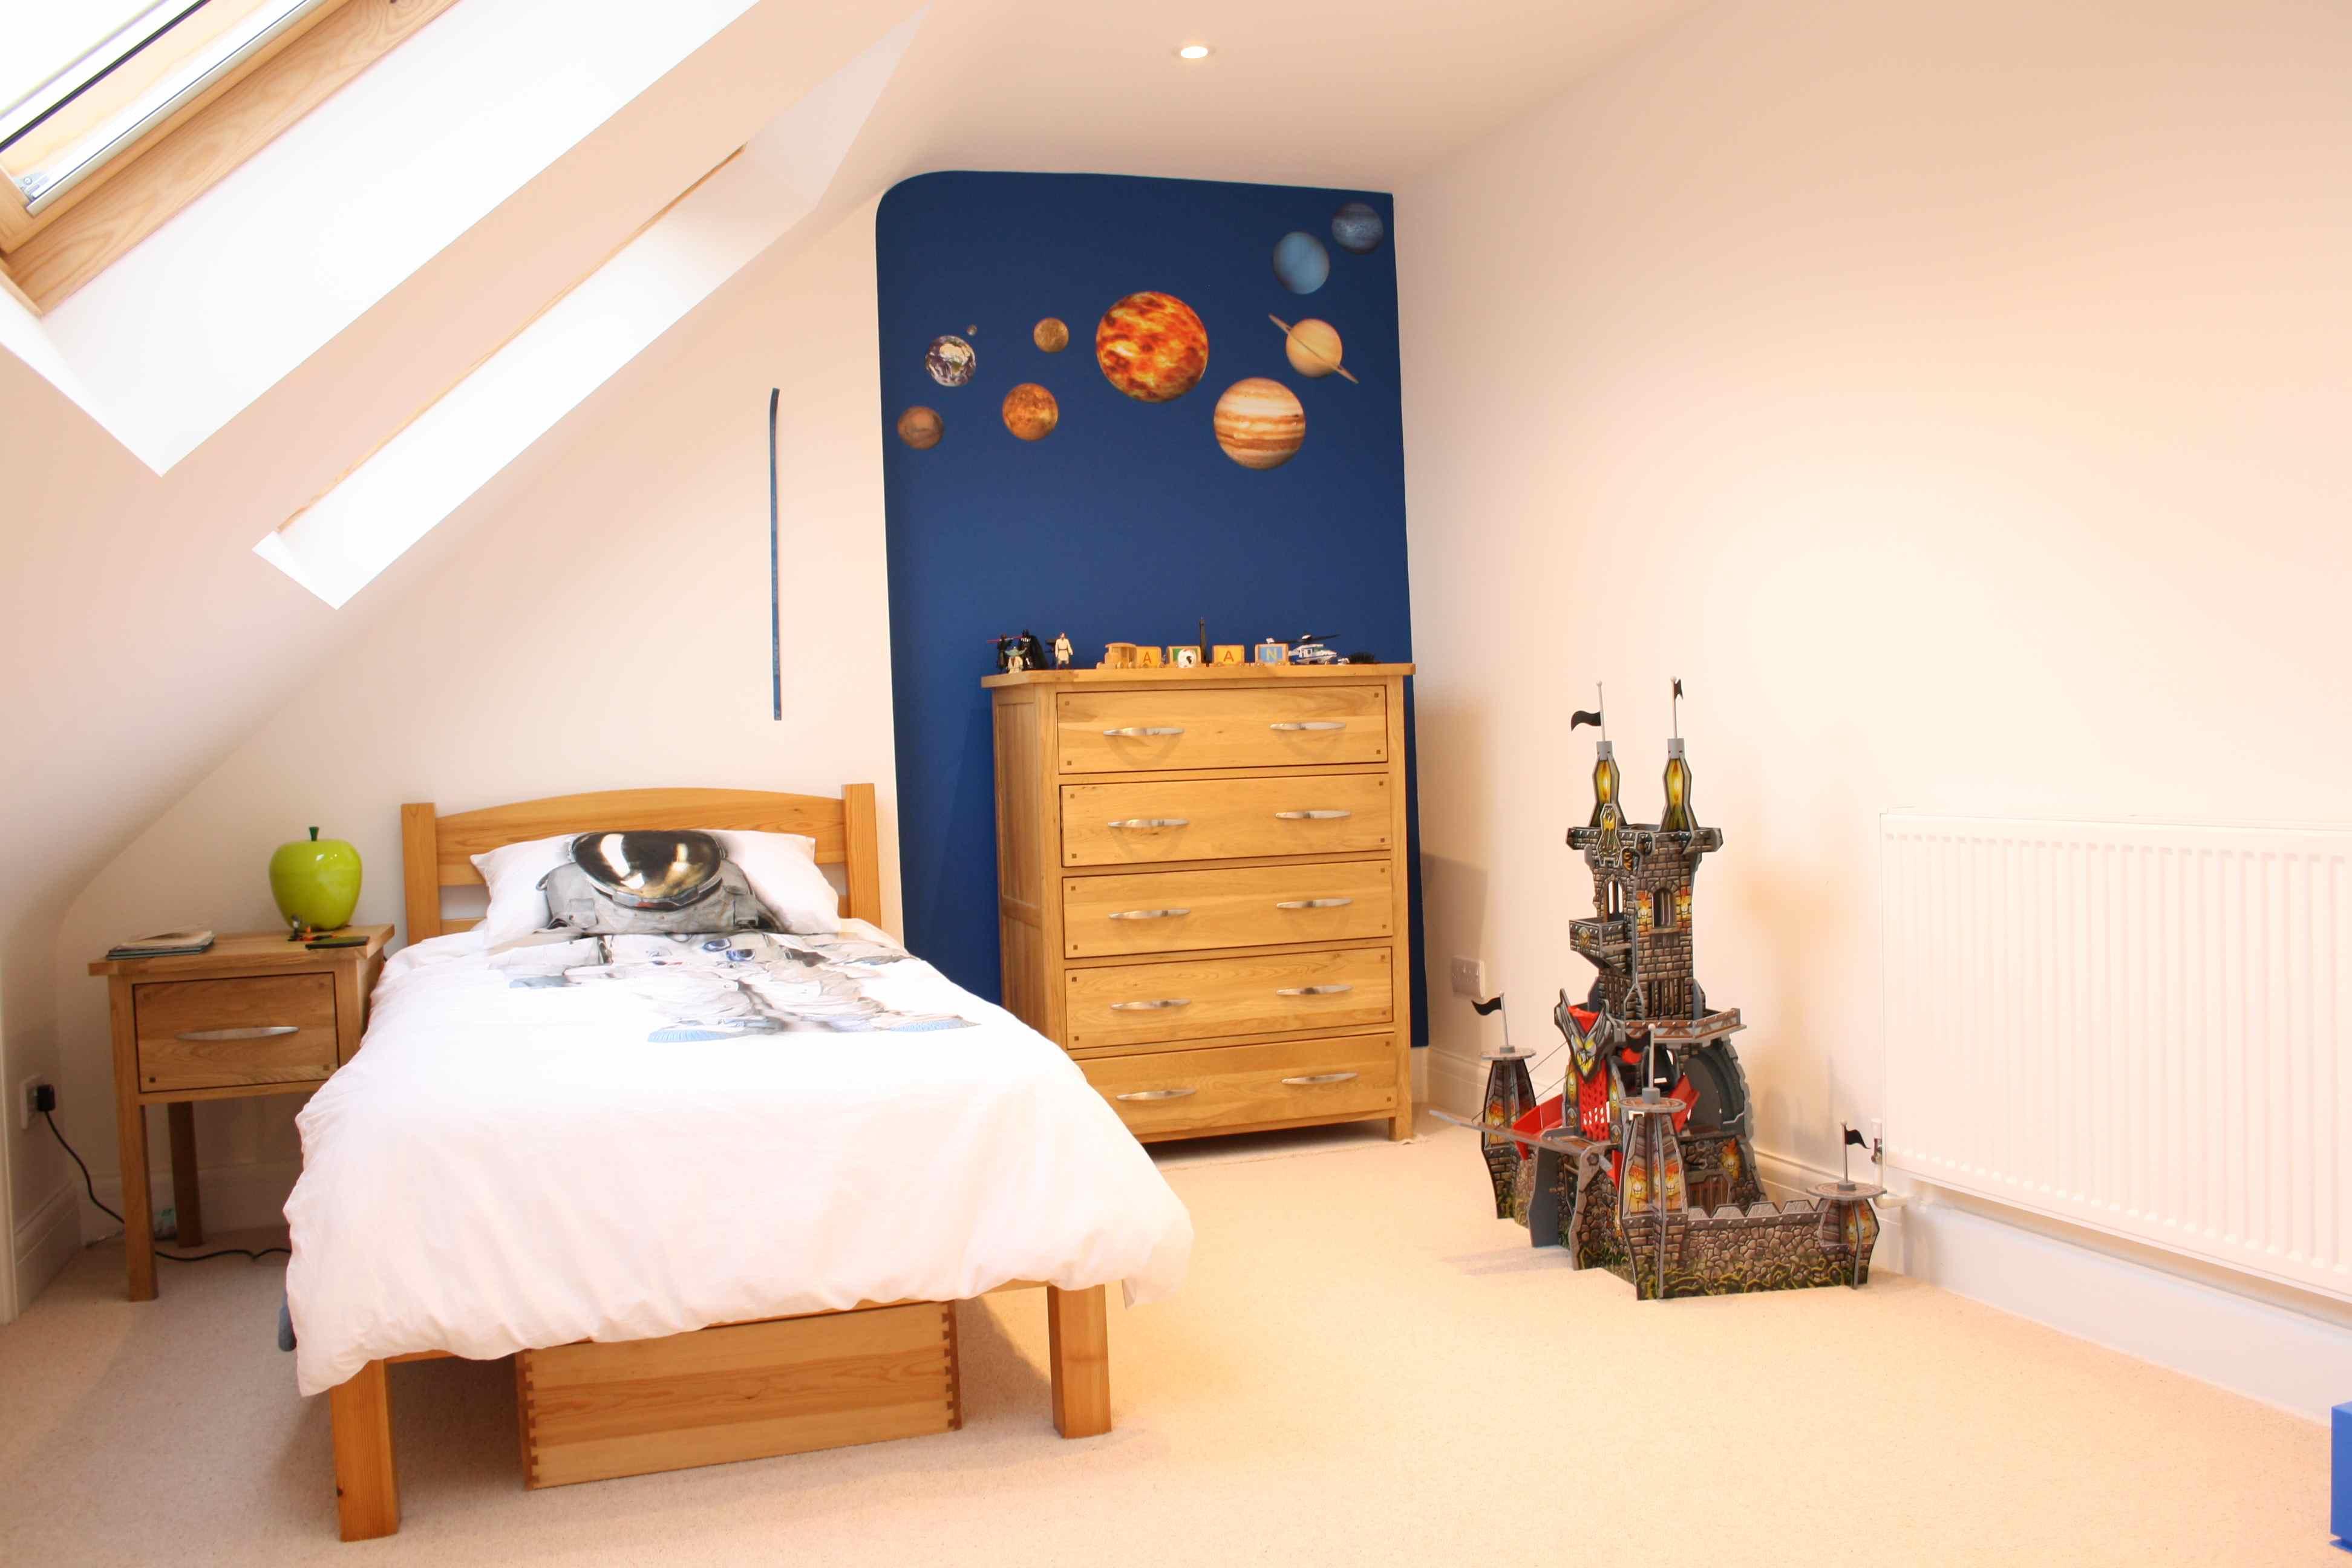 small attic uses - Childrens loft bedroom